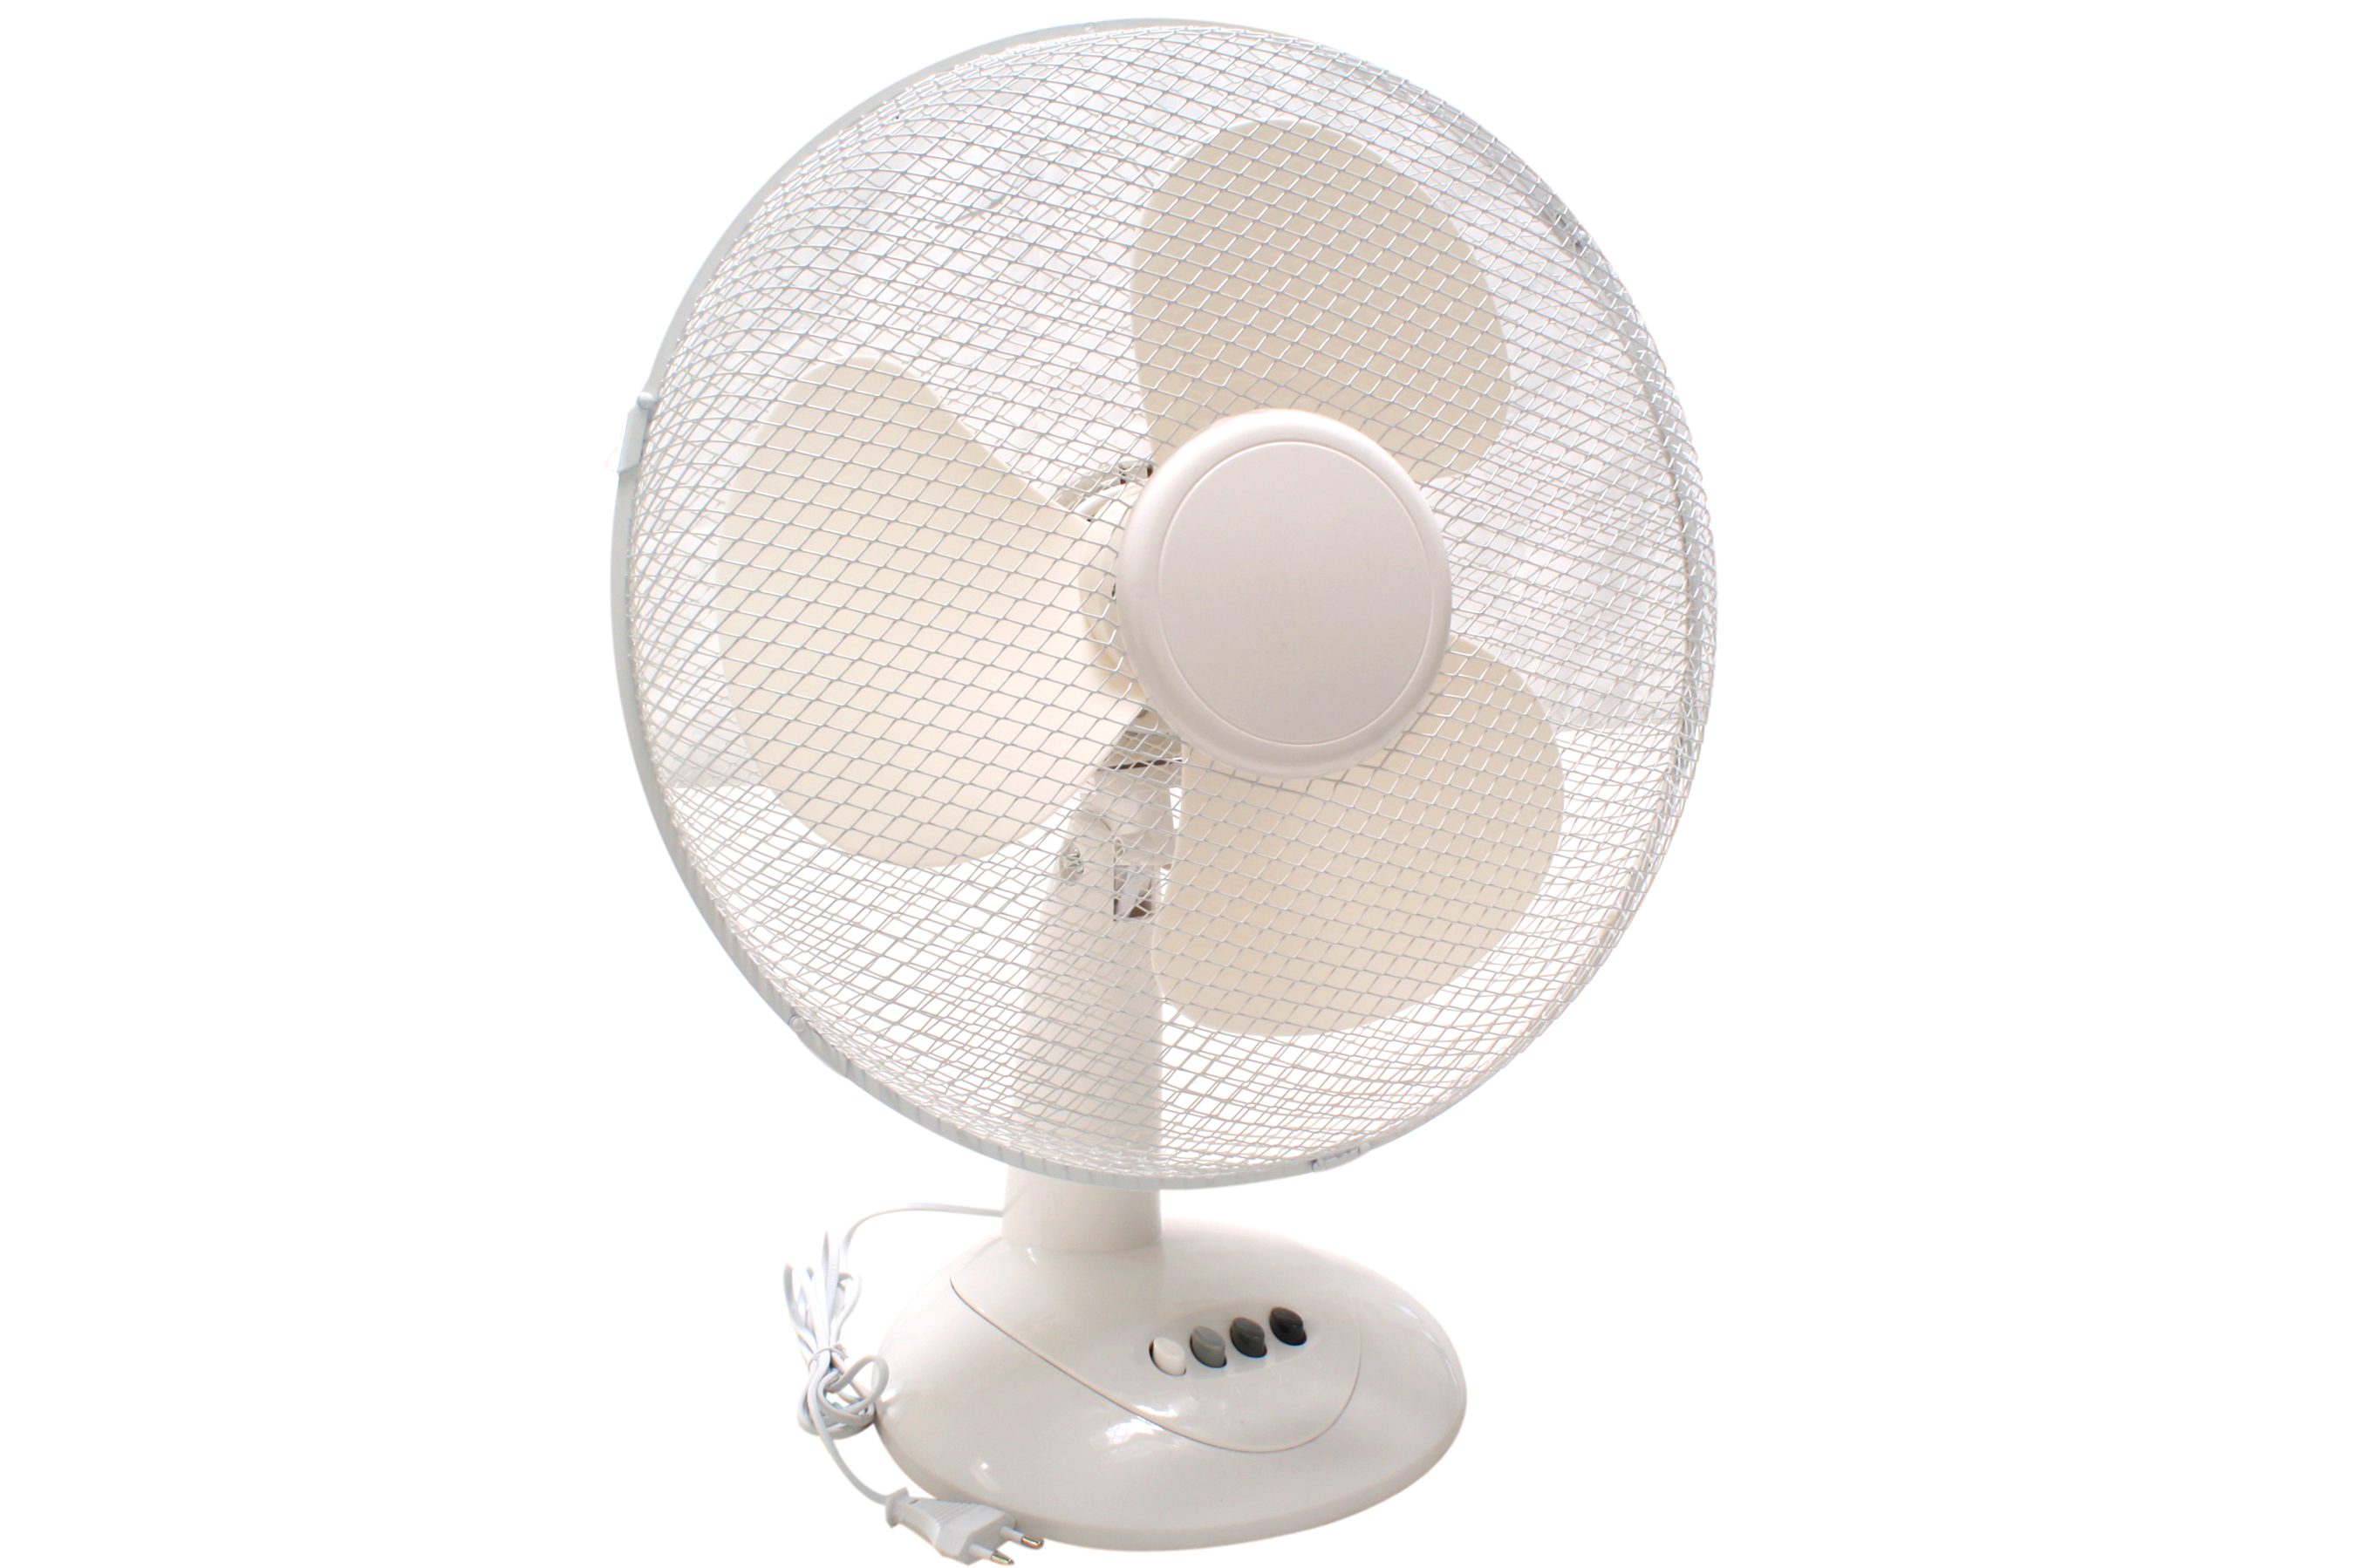 Ventilator / Tischventilator Ø 30 cm 3 Stufen 45 Watt weiß Bild 1